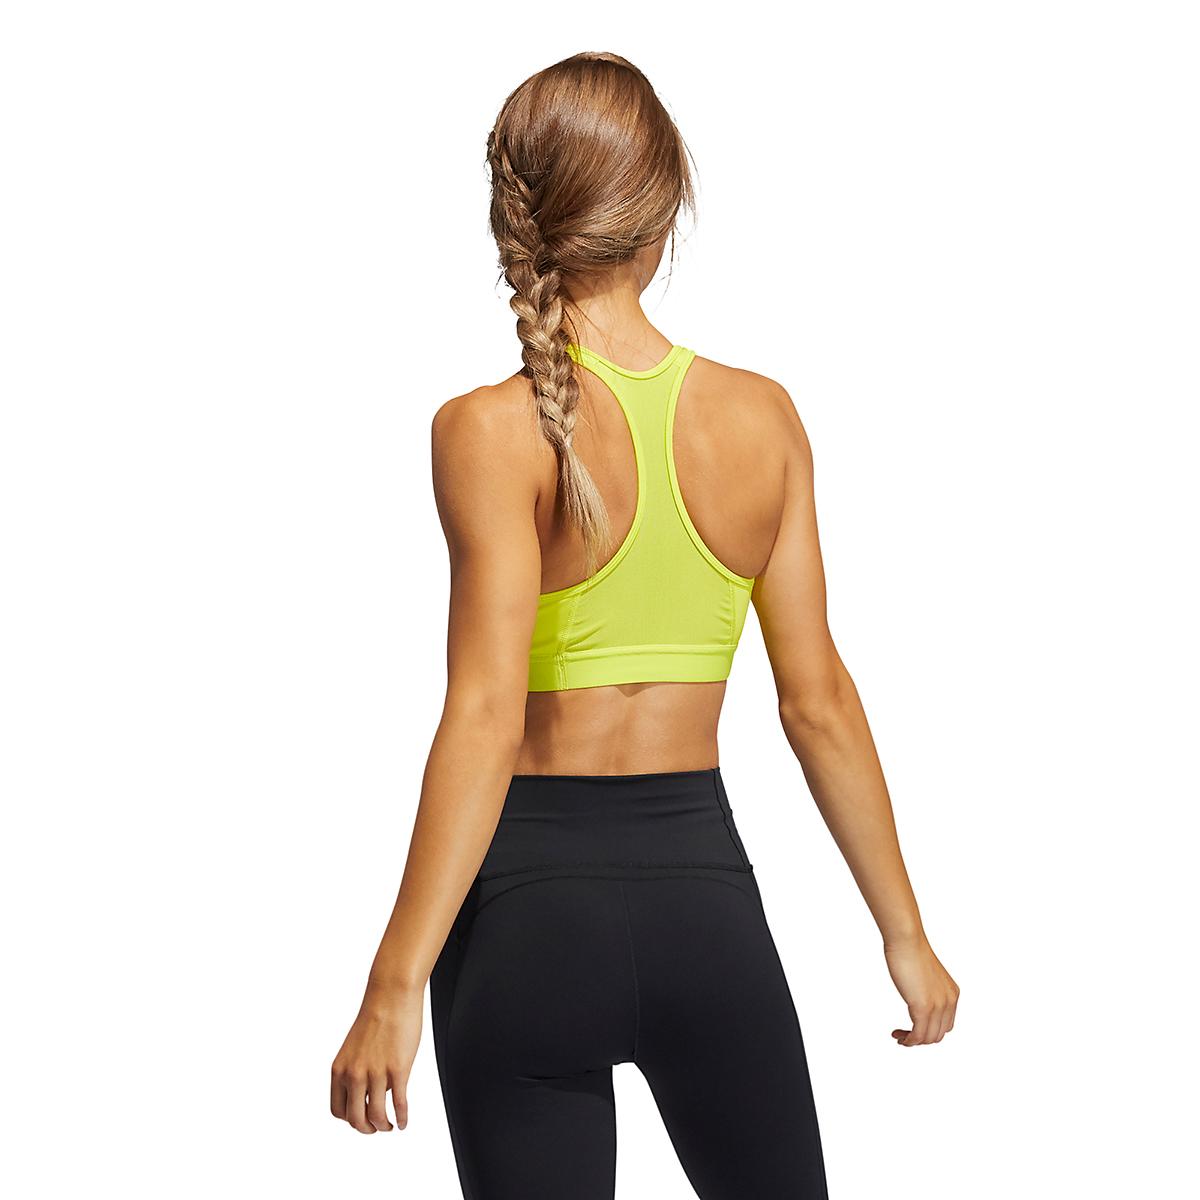 Women's Adidas Don't Rest Alphaskin Bra - Color: Acid Yellow - Size: XXS, Acid Yellow, large, image 2